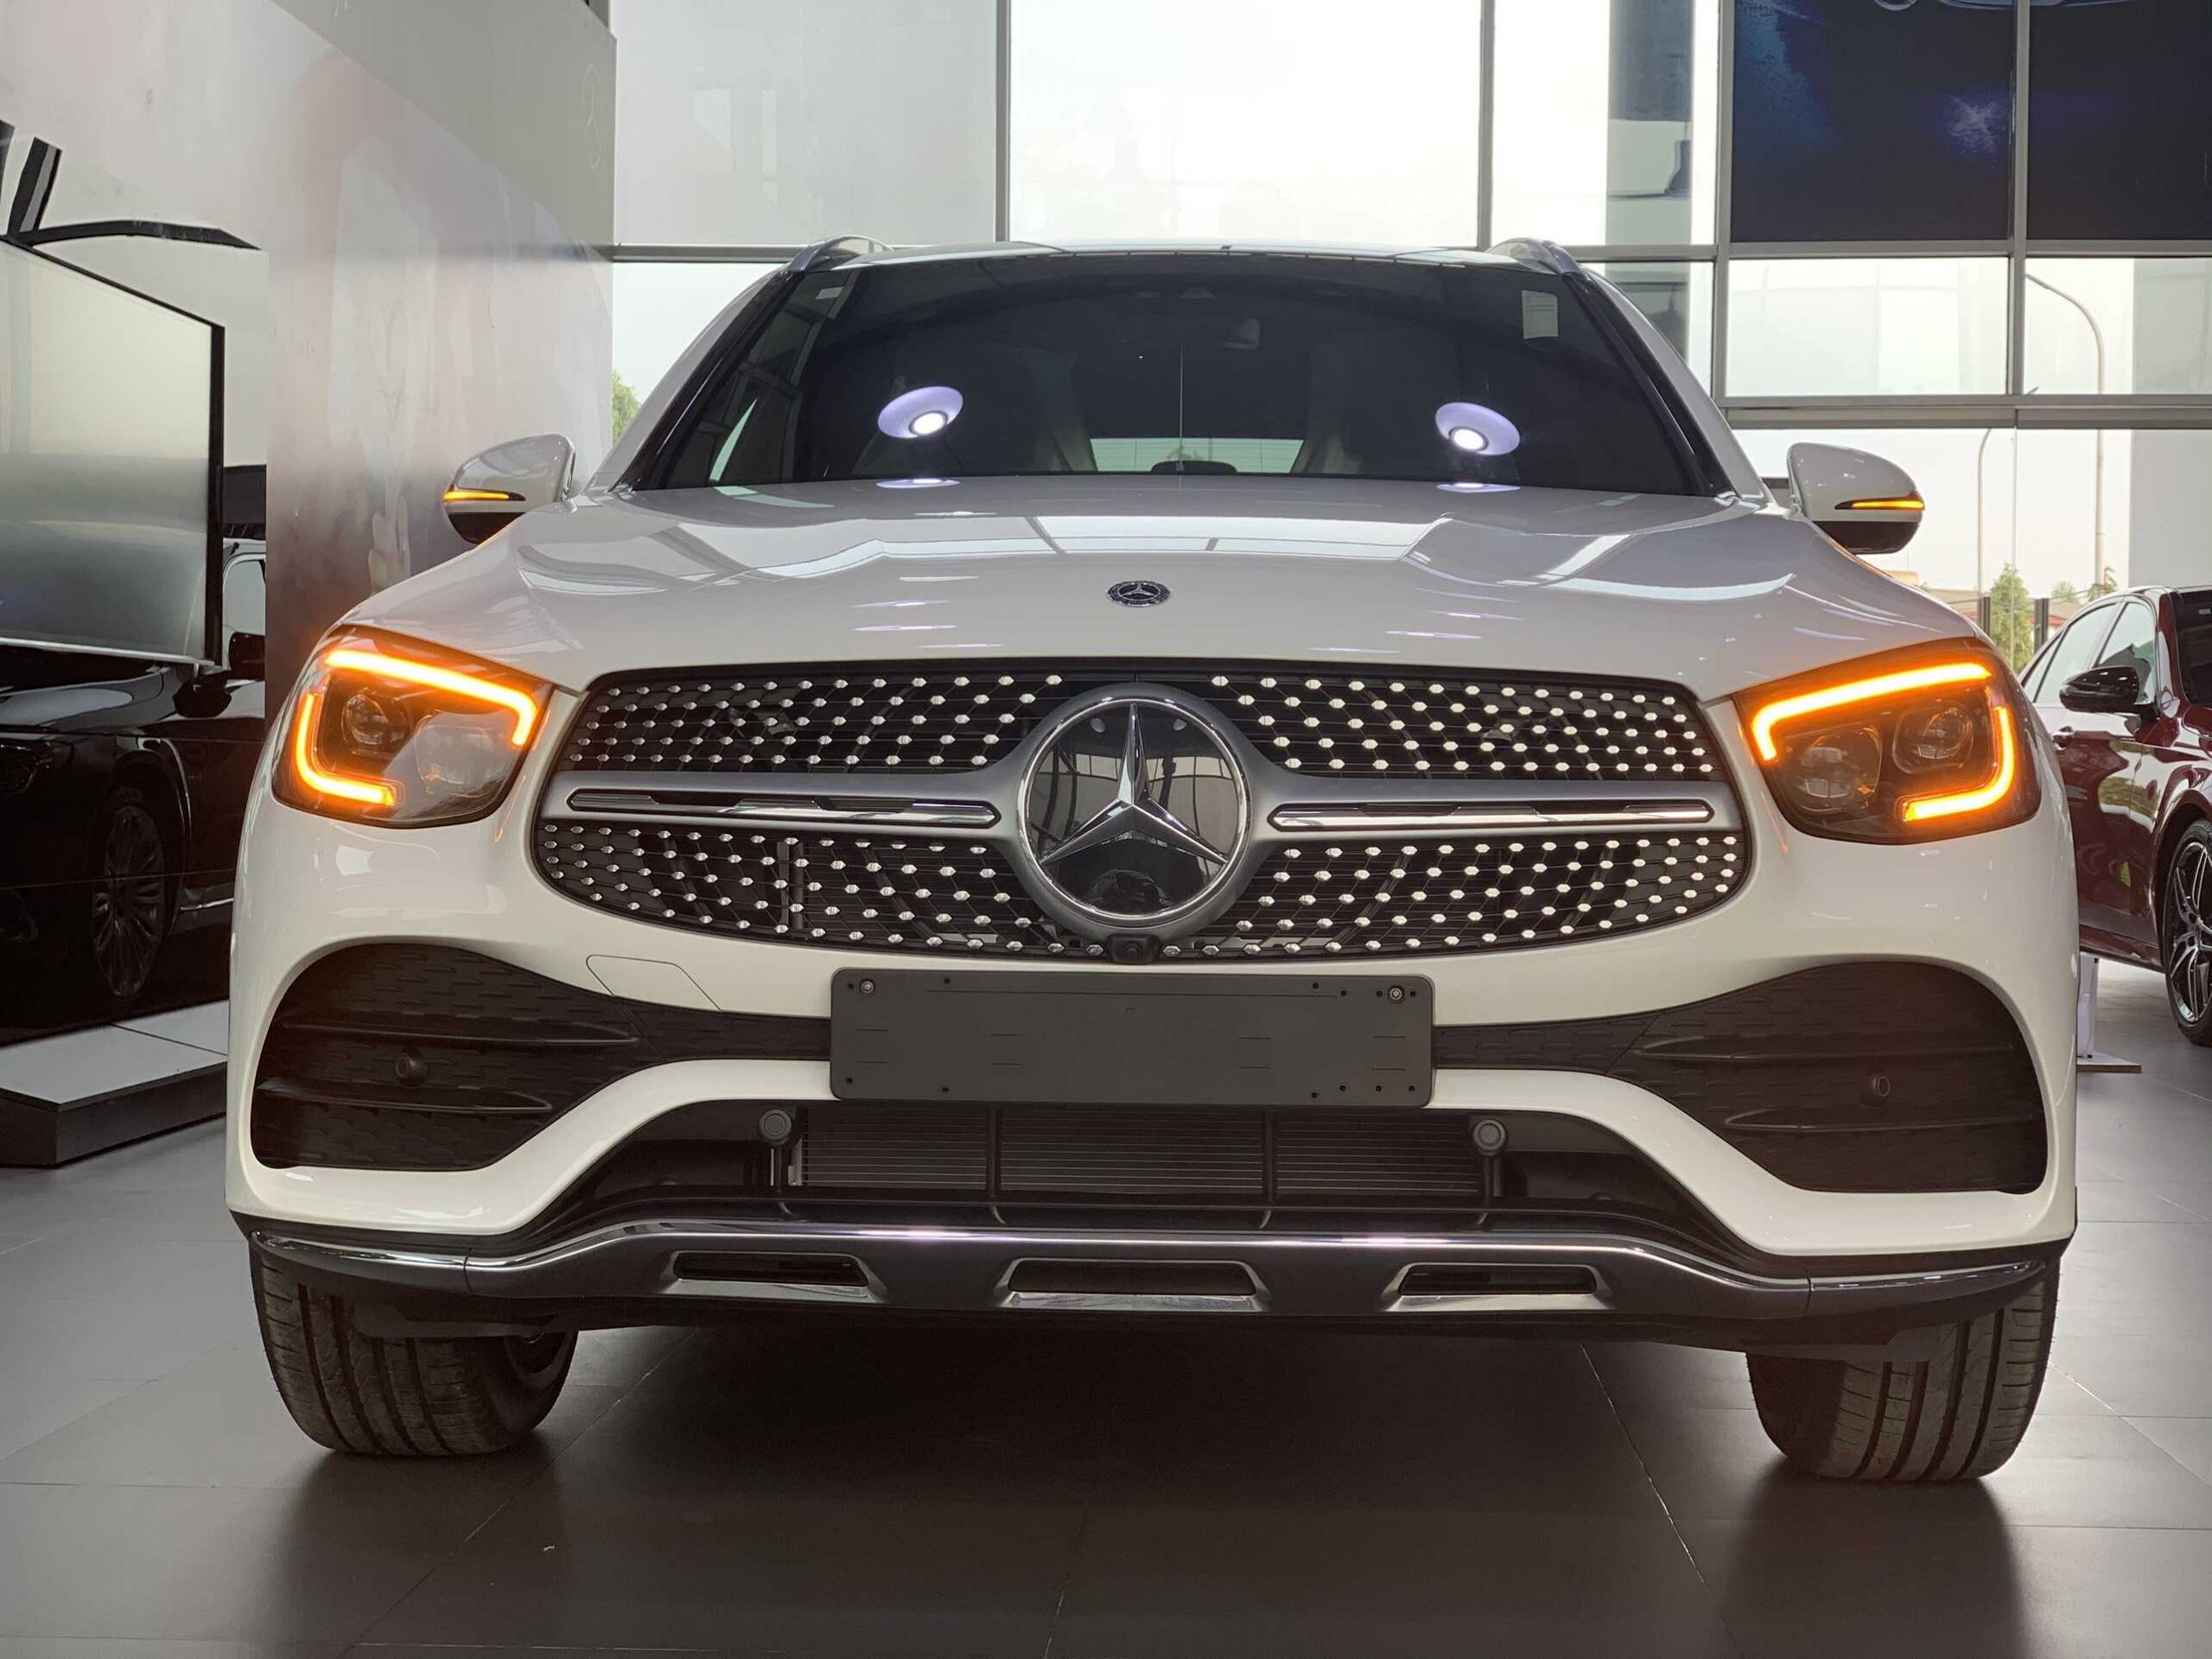 Mercedes GLC 300 4Matic 2022 mercedes ha noi (2)